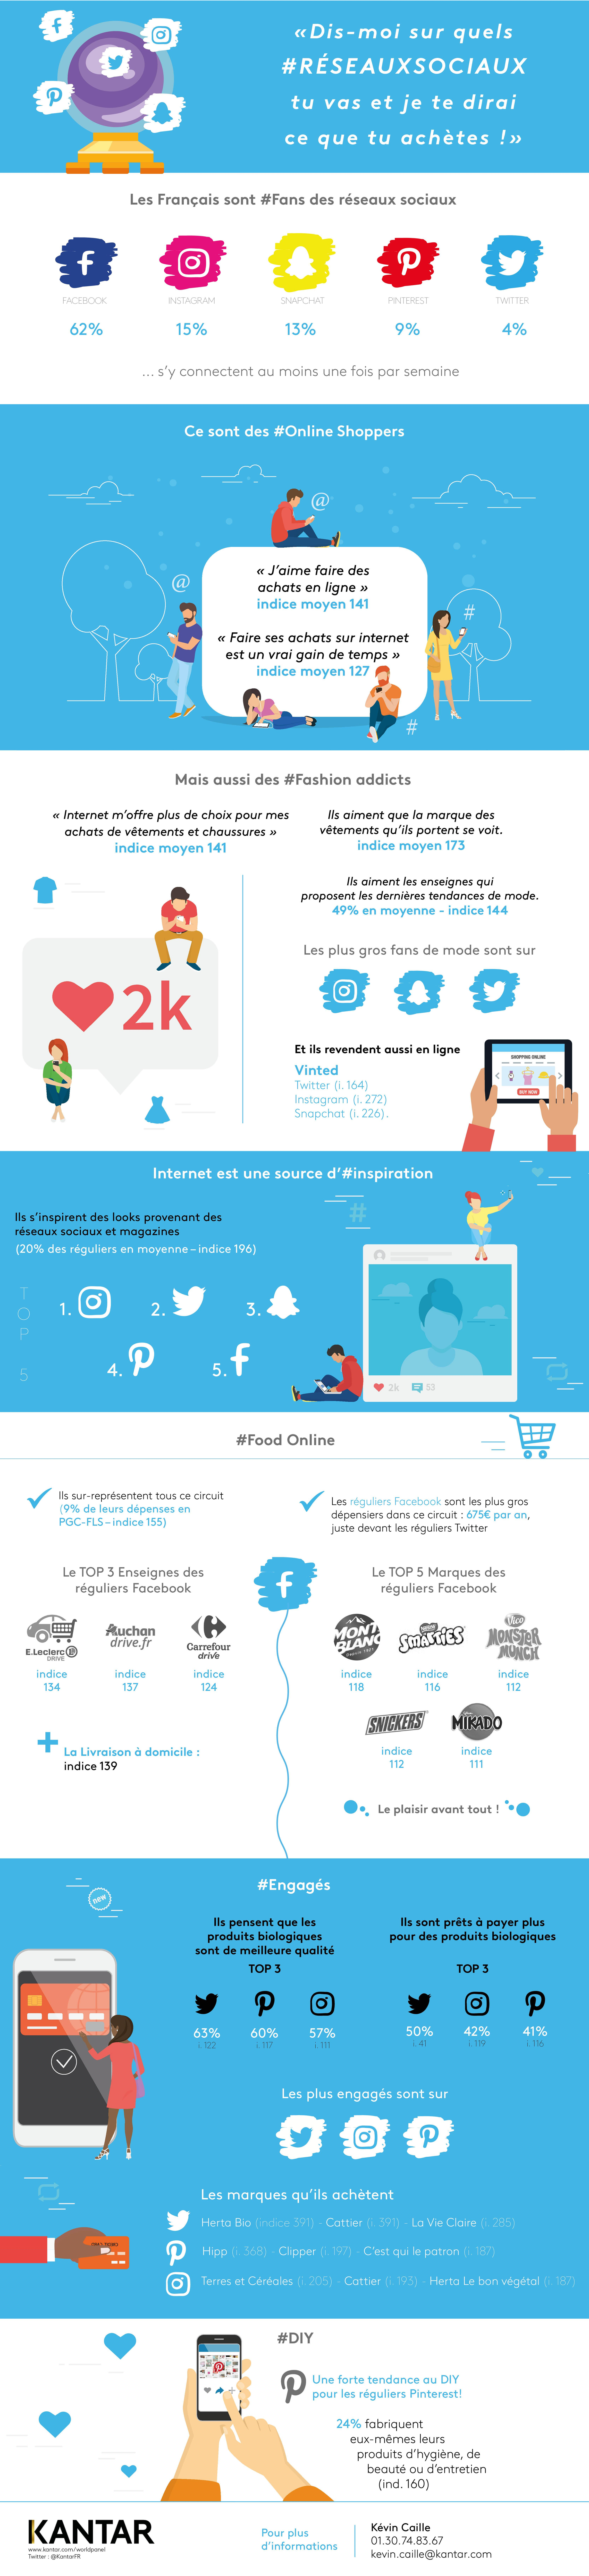 Infographie_Saga_medias.jpg